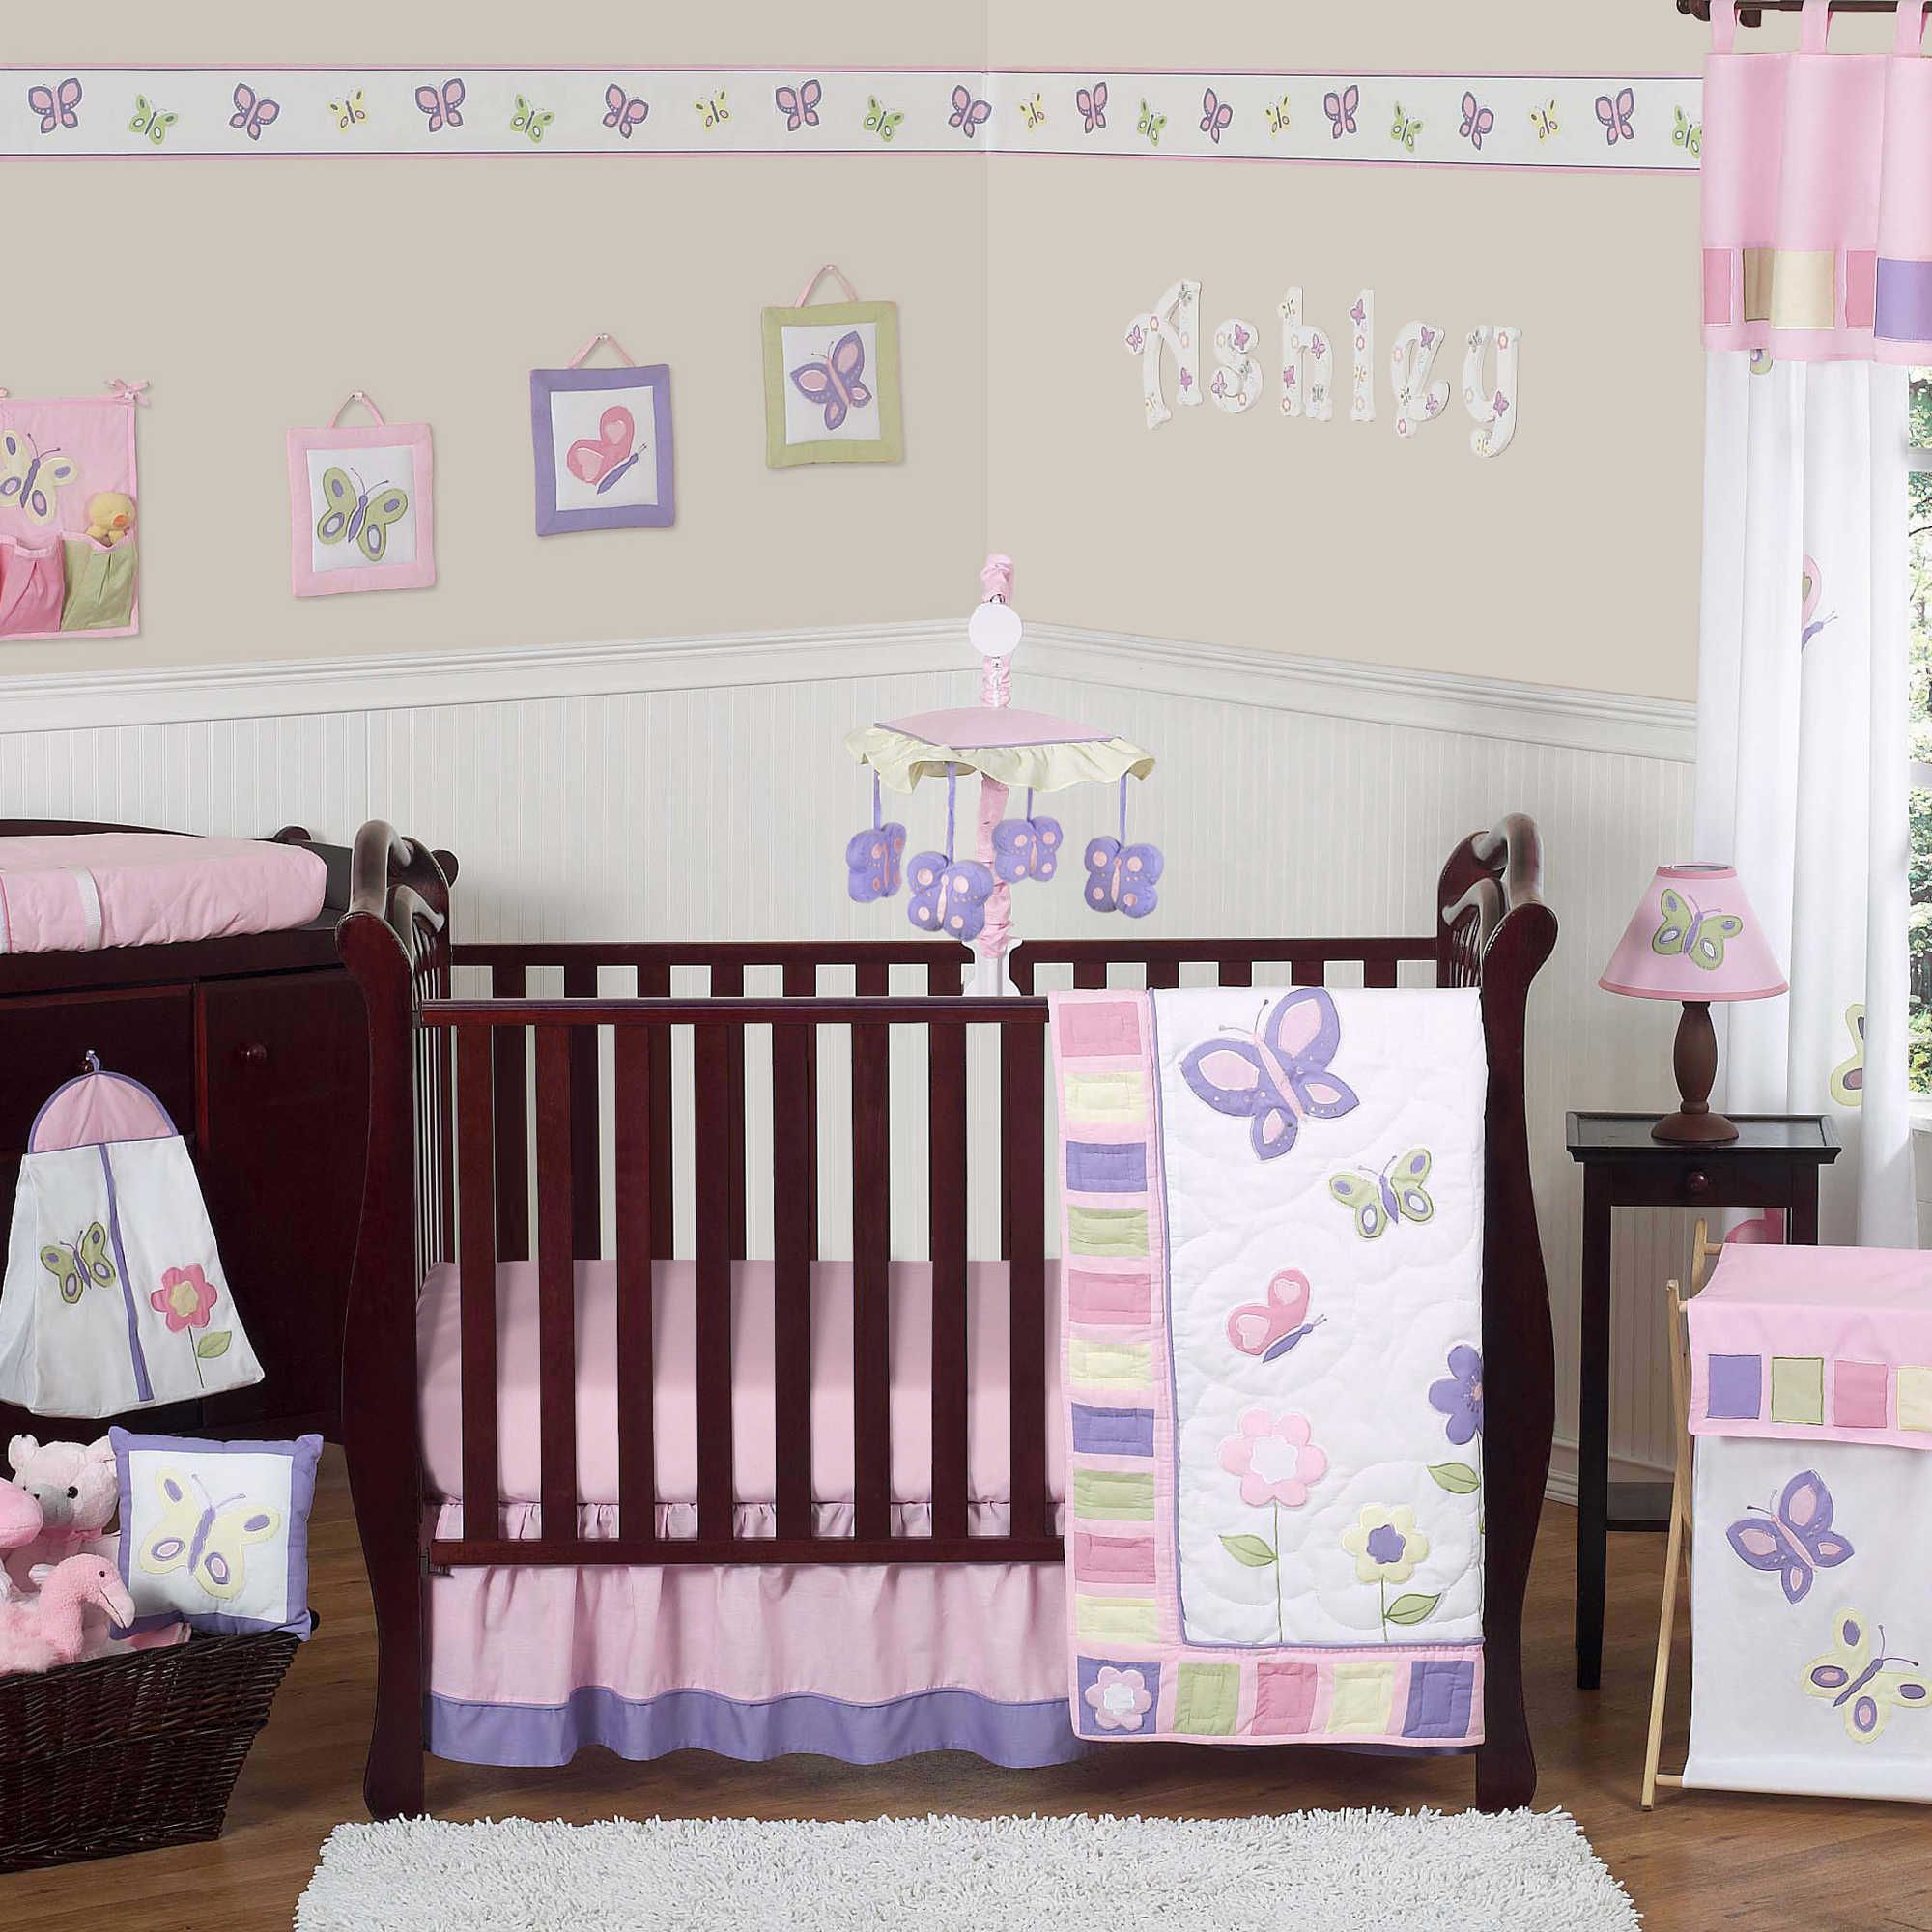 Sweet Jojo Designs Butterfly 11 Piece Crib Bedding Set In Pink